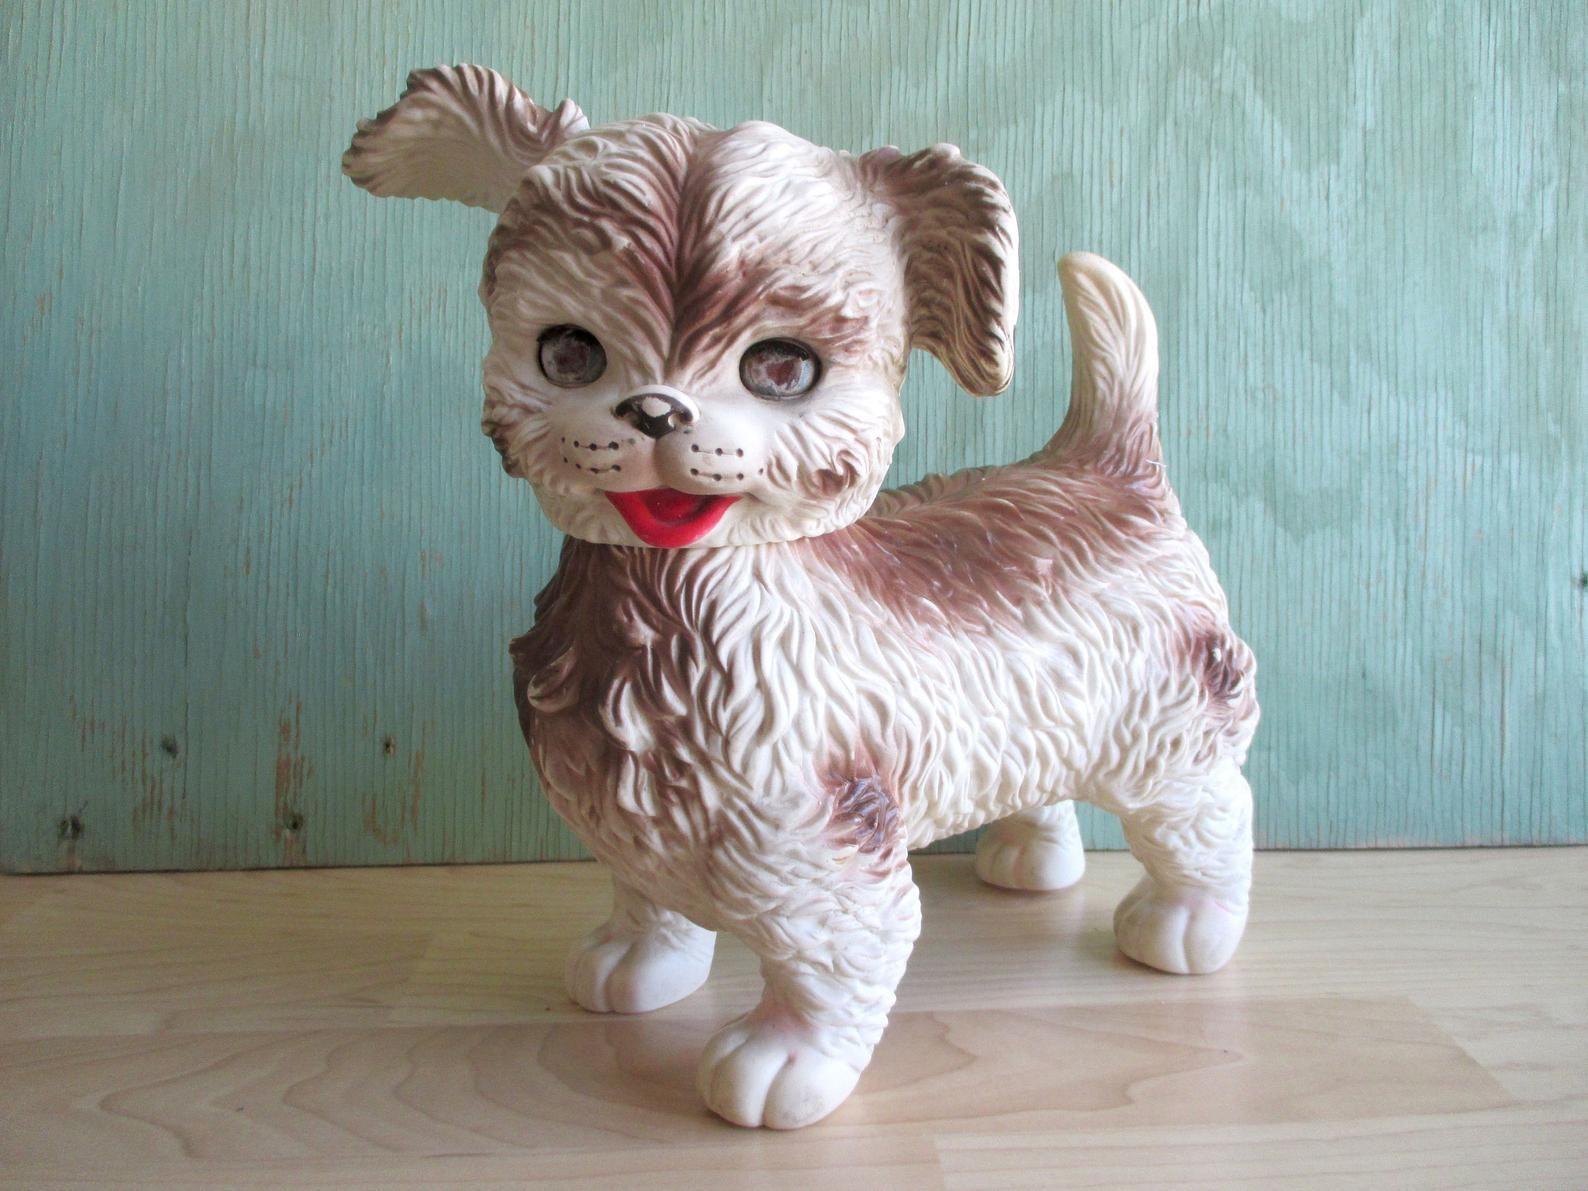 Vintage Edward Mobely Toy Dog 1960s Kitschy Rubber Squeak Toy